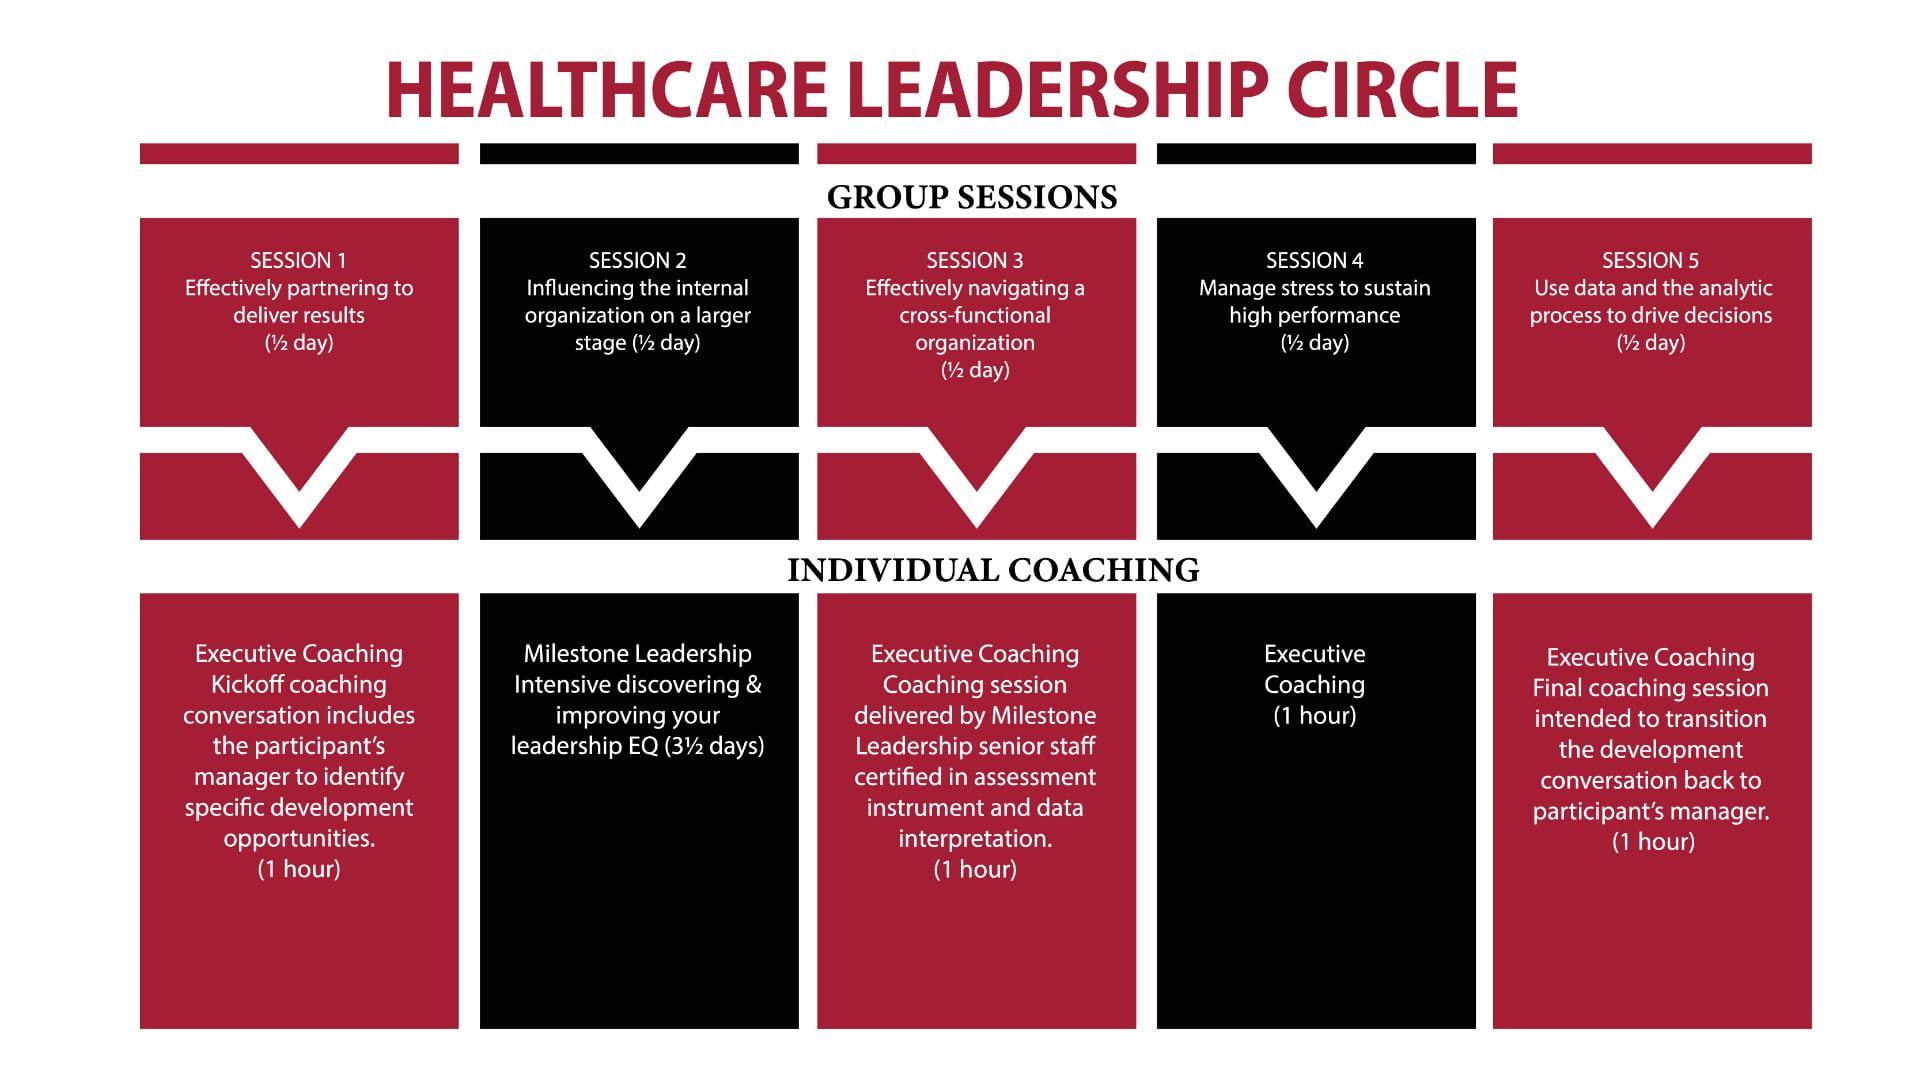 Healthcare_leadershipcircle_infographic (1)